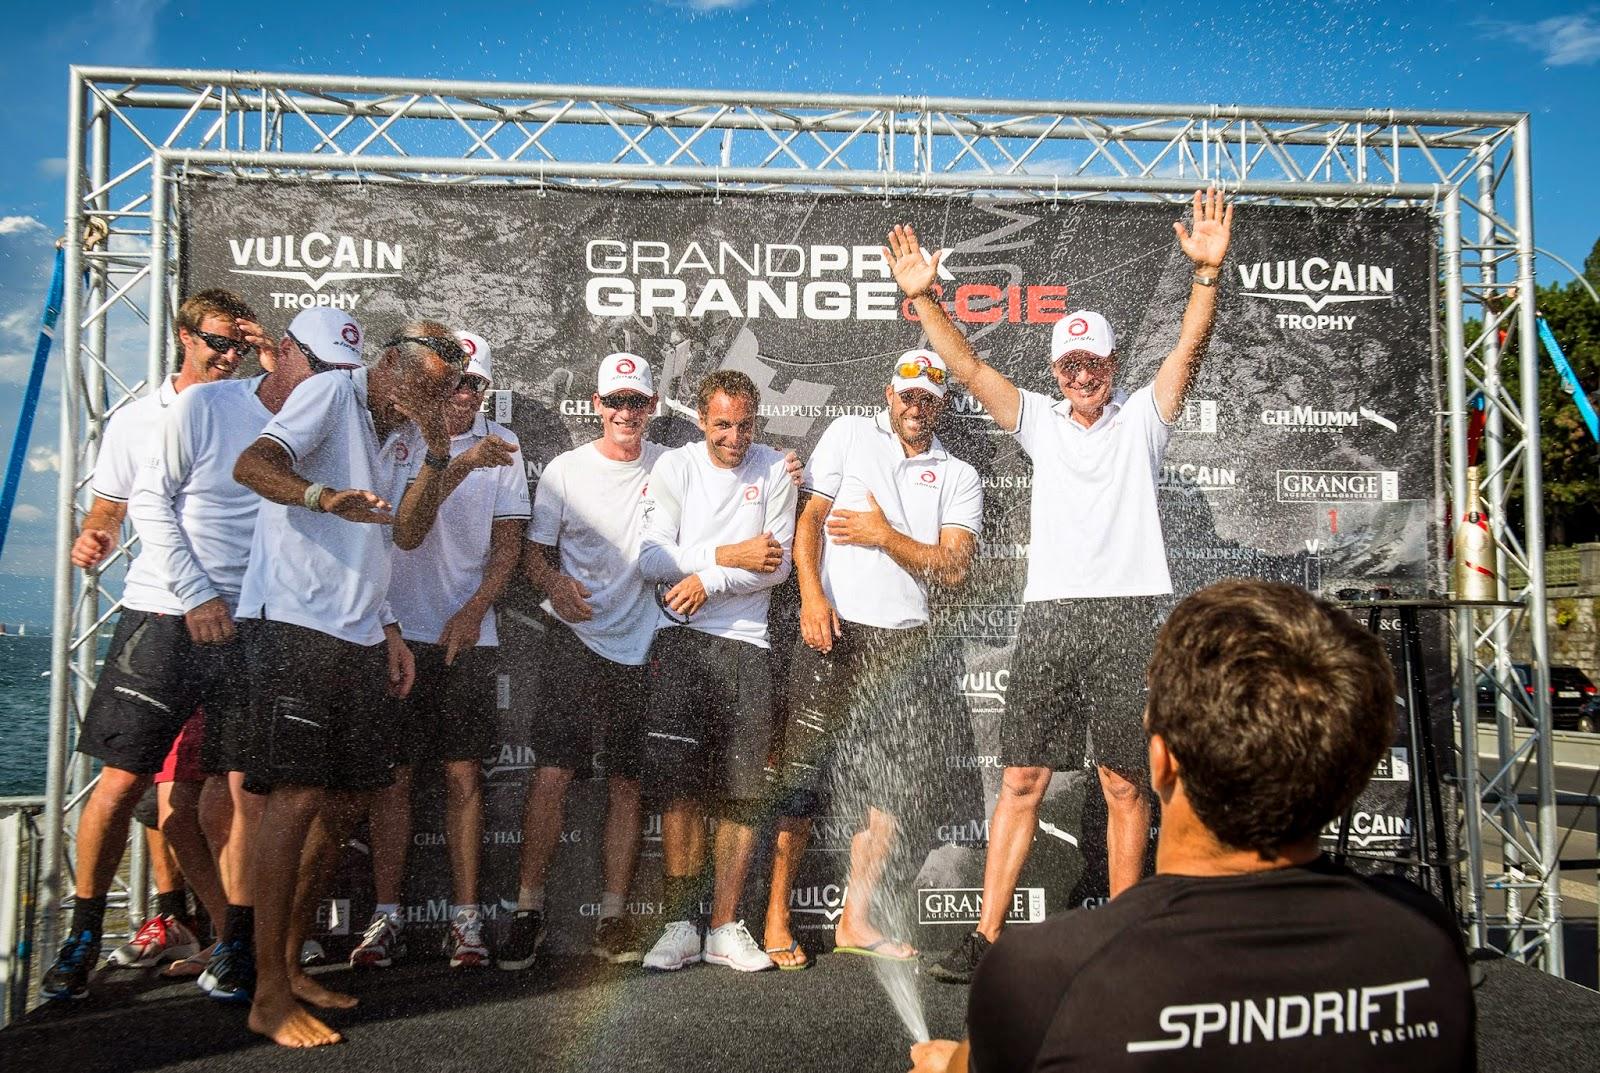 Ernesto Bertarelli et Alinghi remportent le Vulcain Trophy !